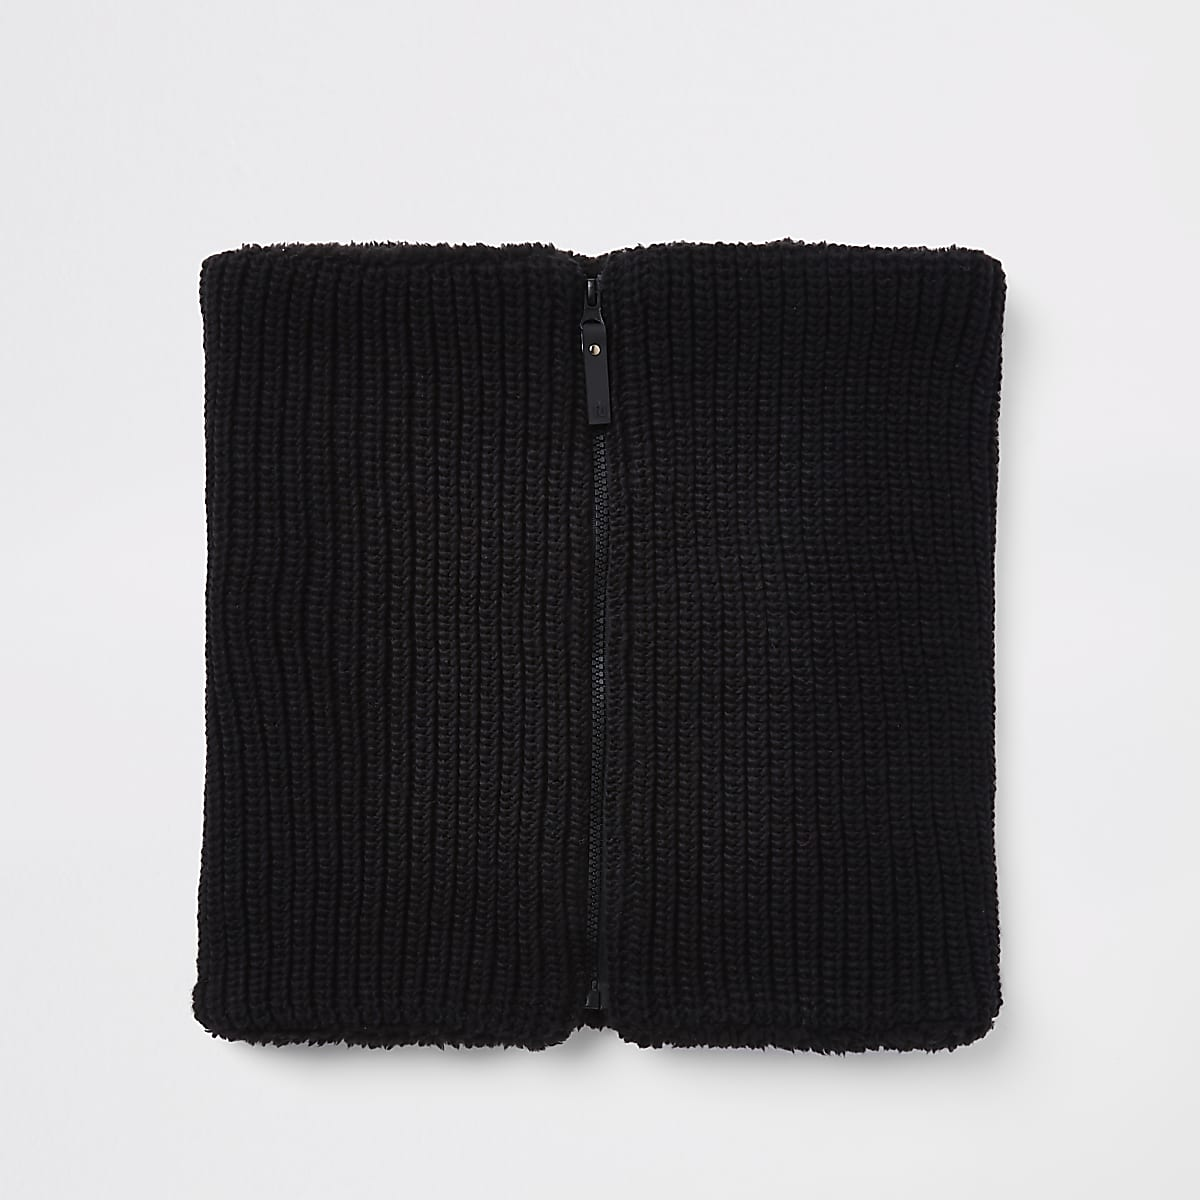 Black knit snood